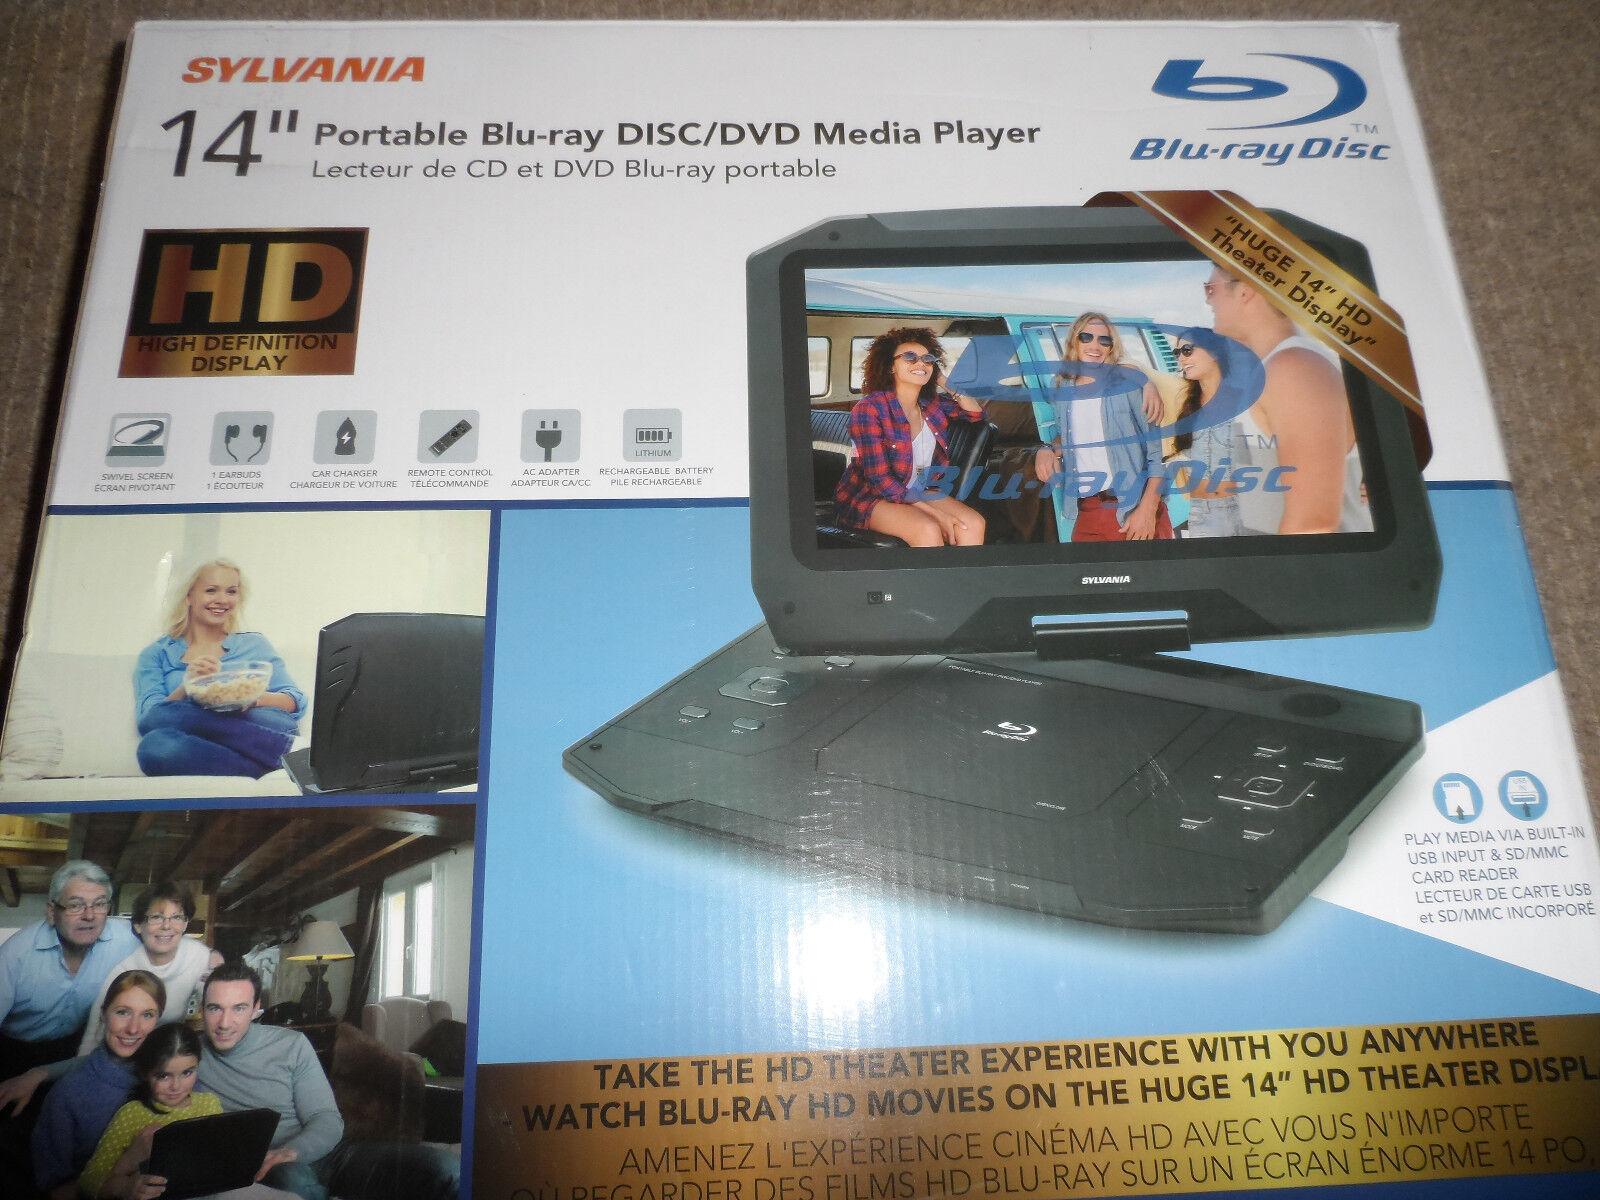 "SYLVANIA 14"" HD Portable Blu-ray Disc/DVD Media Player *NEW*"